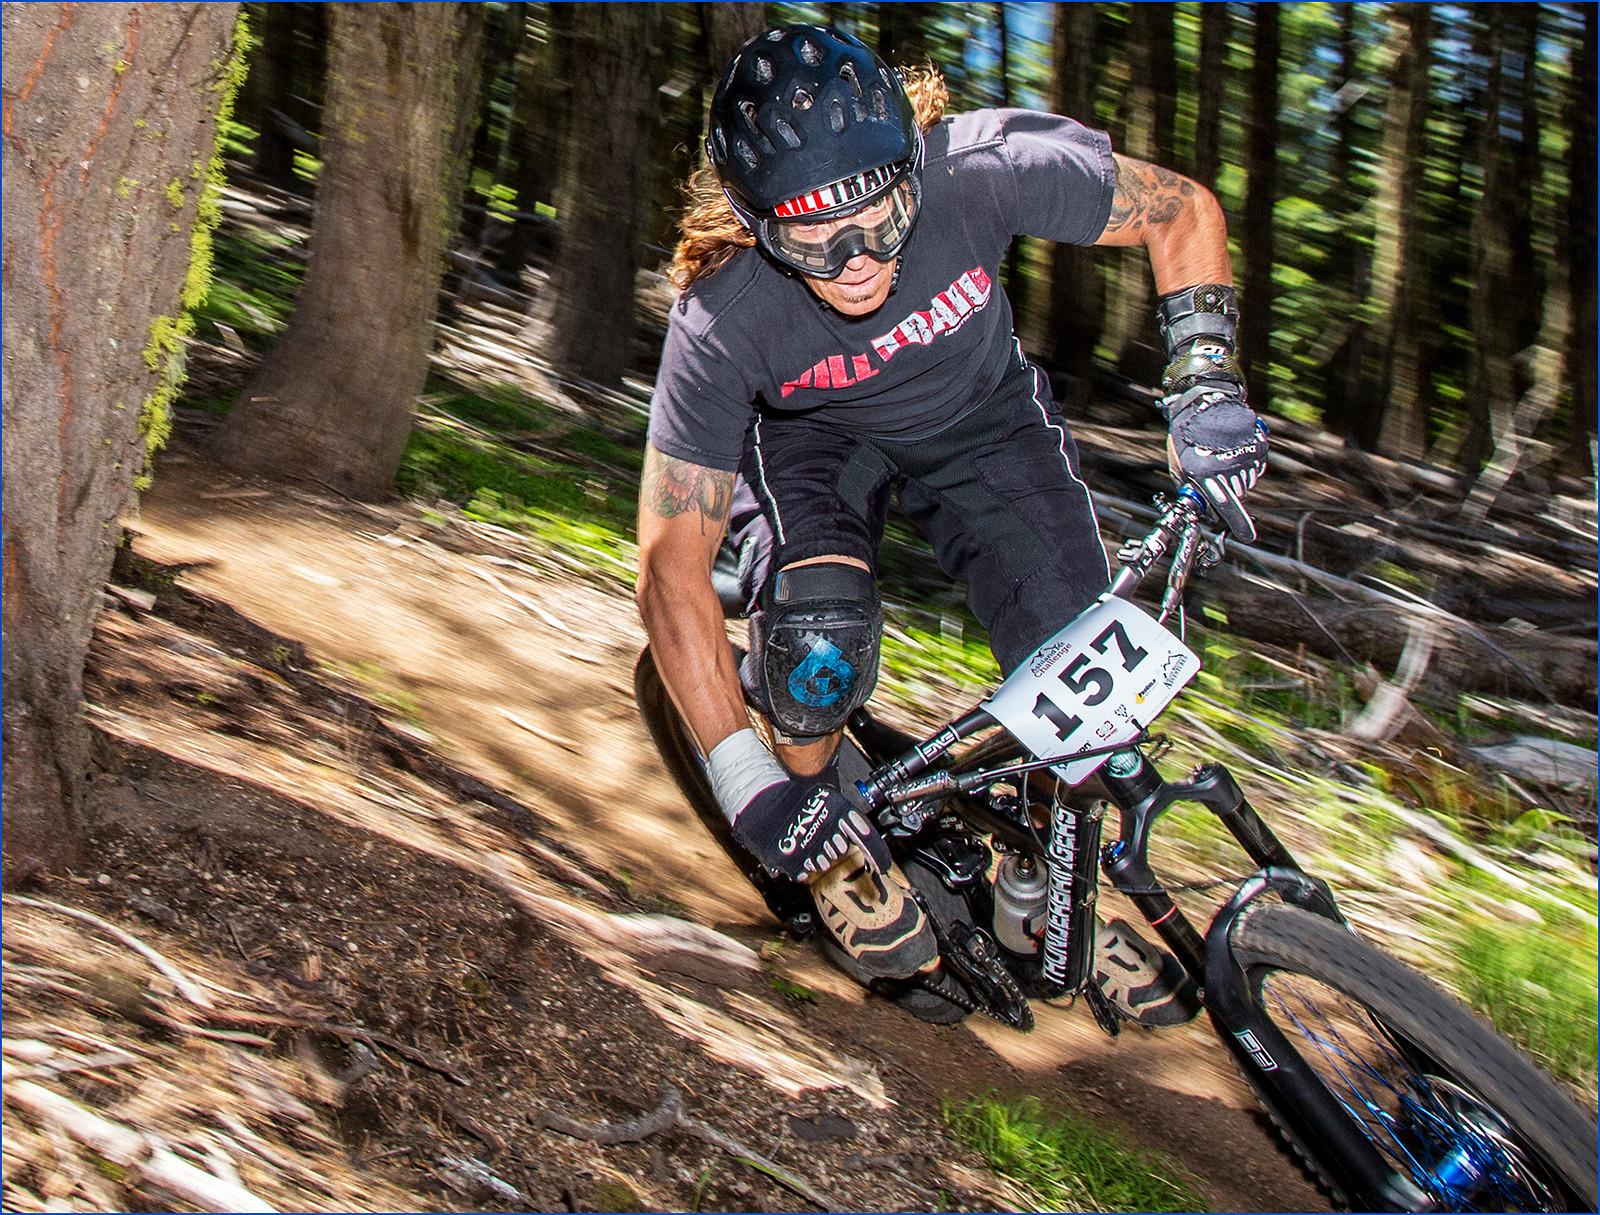 Ashland Mountain Challenge Enduro Winning Run - marty crosley - Mountain Biking Pictures - Vital MTB